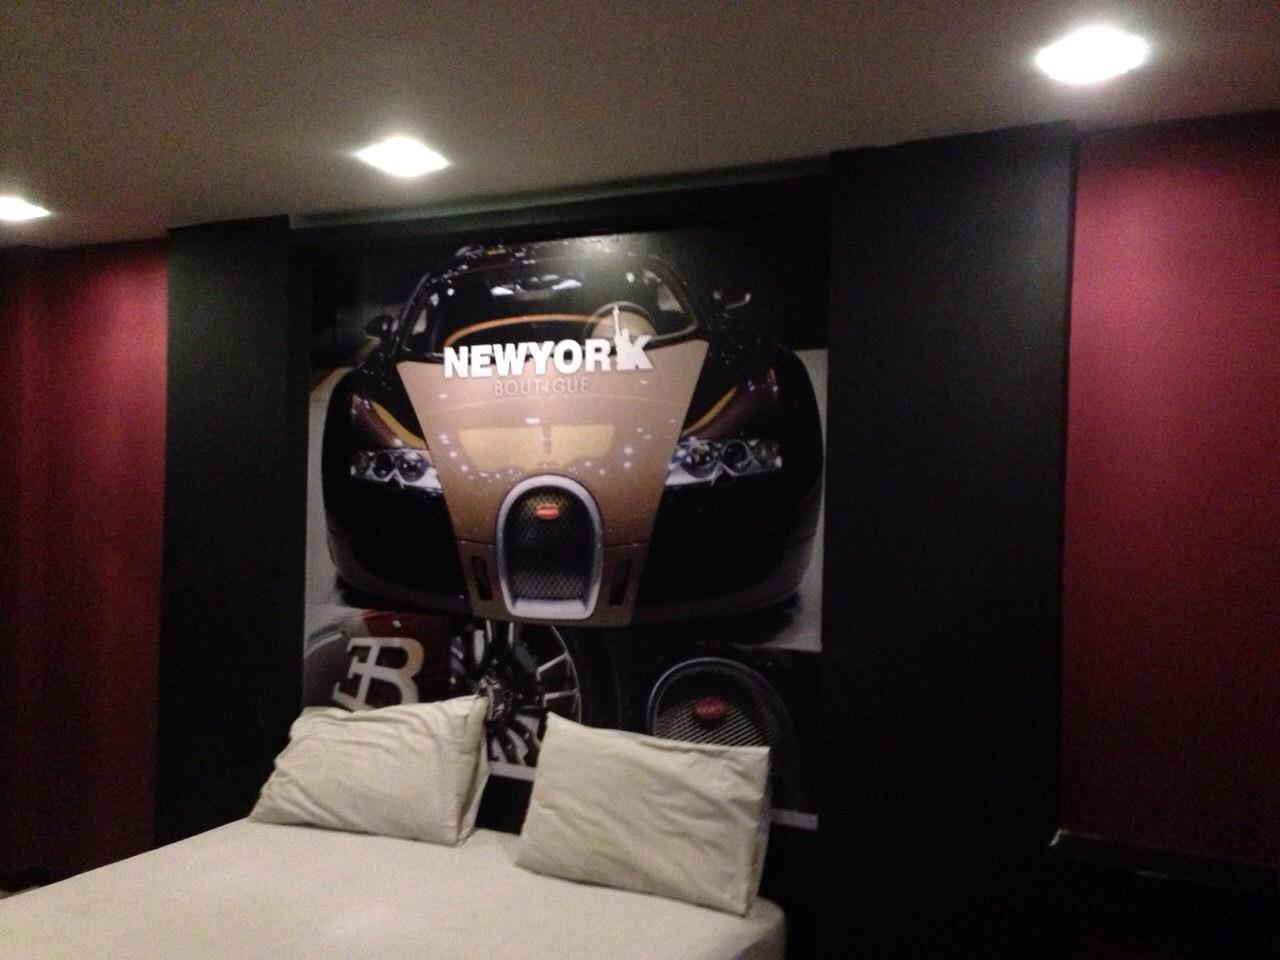 Newyork Suite Hotel,โรงแรมนิวยอร์ค สวีท